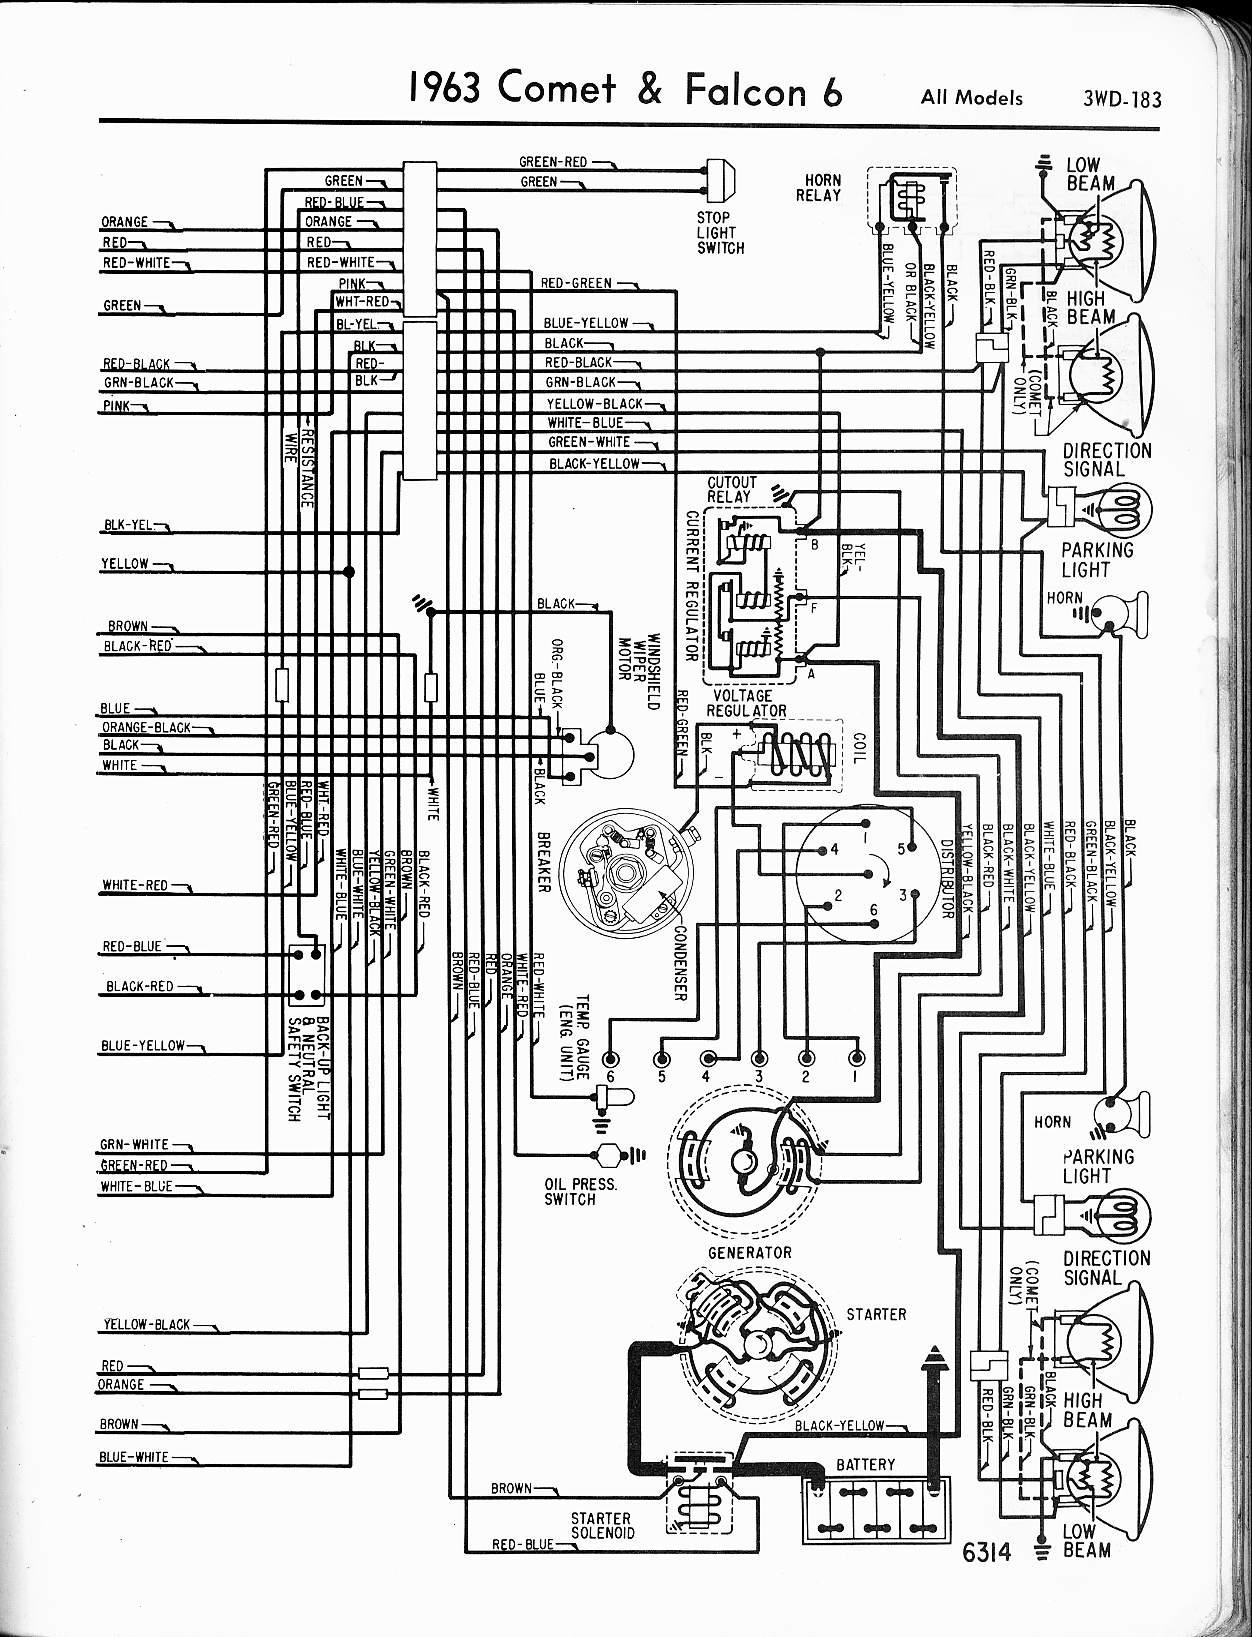 63 Falcon Wiring Diagram FordForumsOnline Com